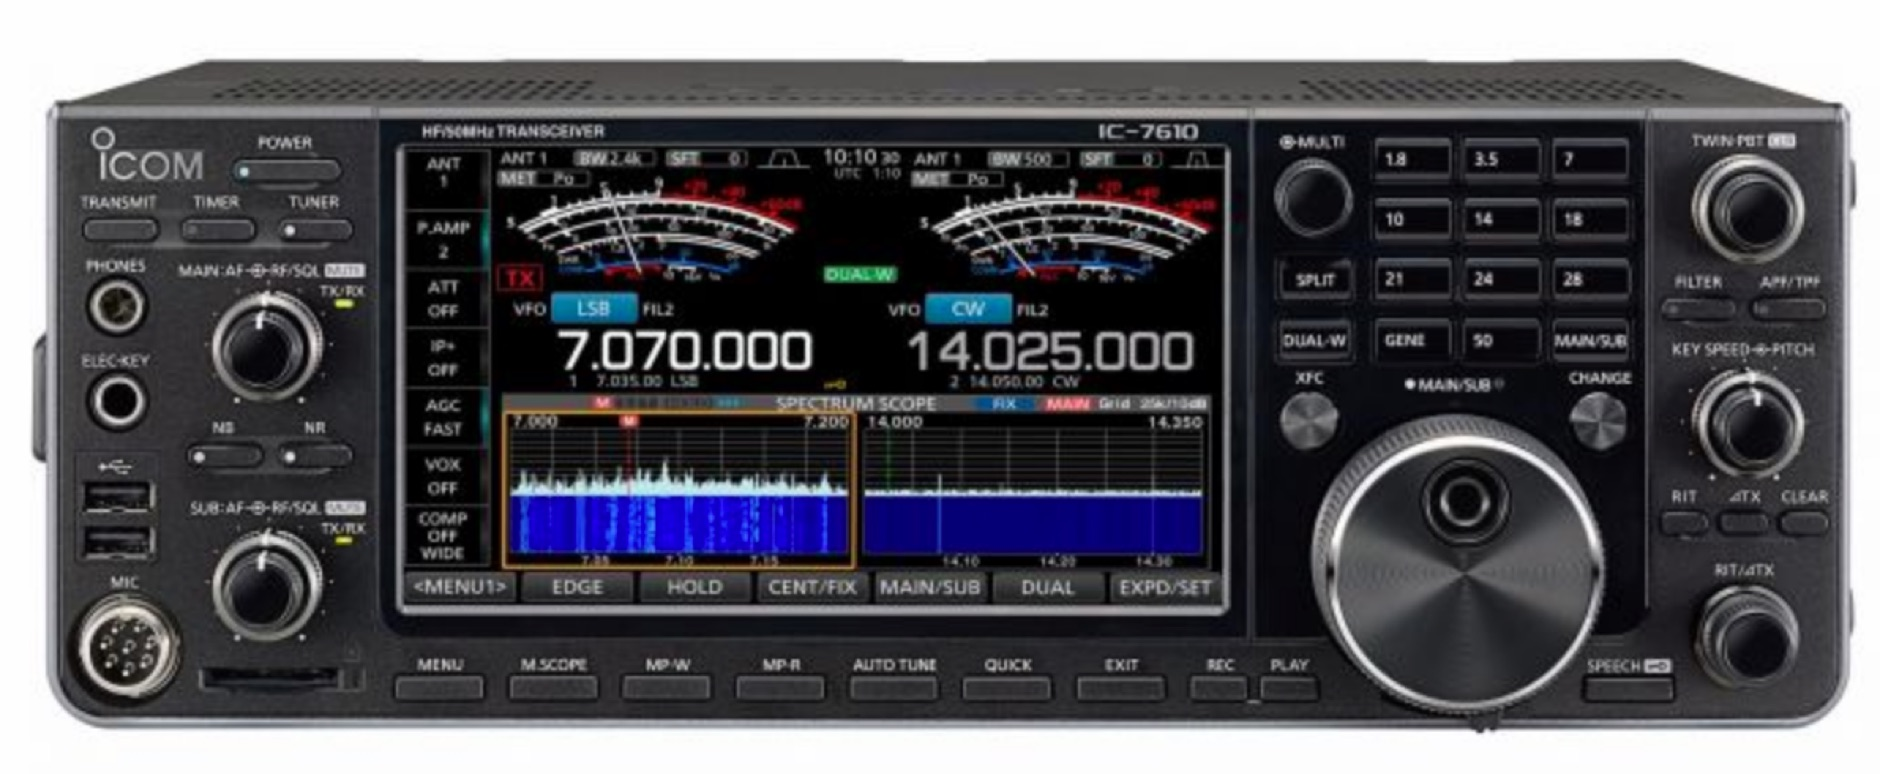 ICOM IC-7610 Sherwood Review